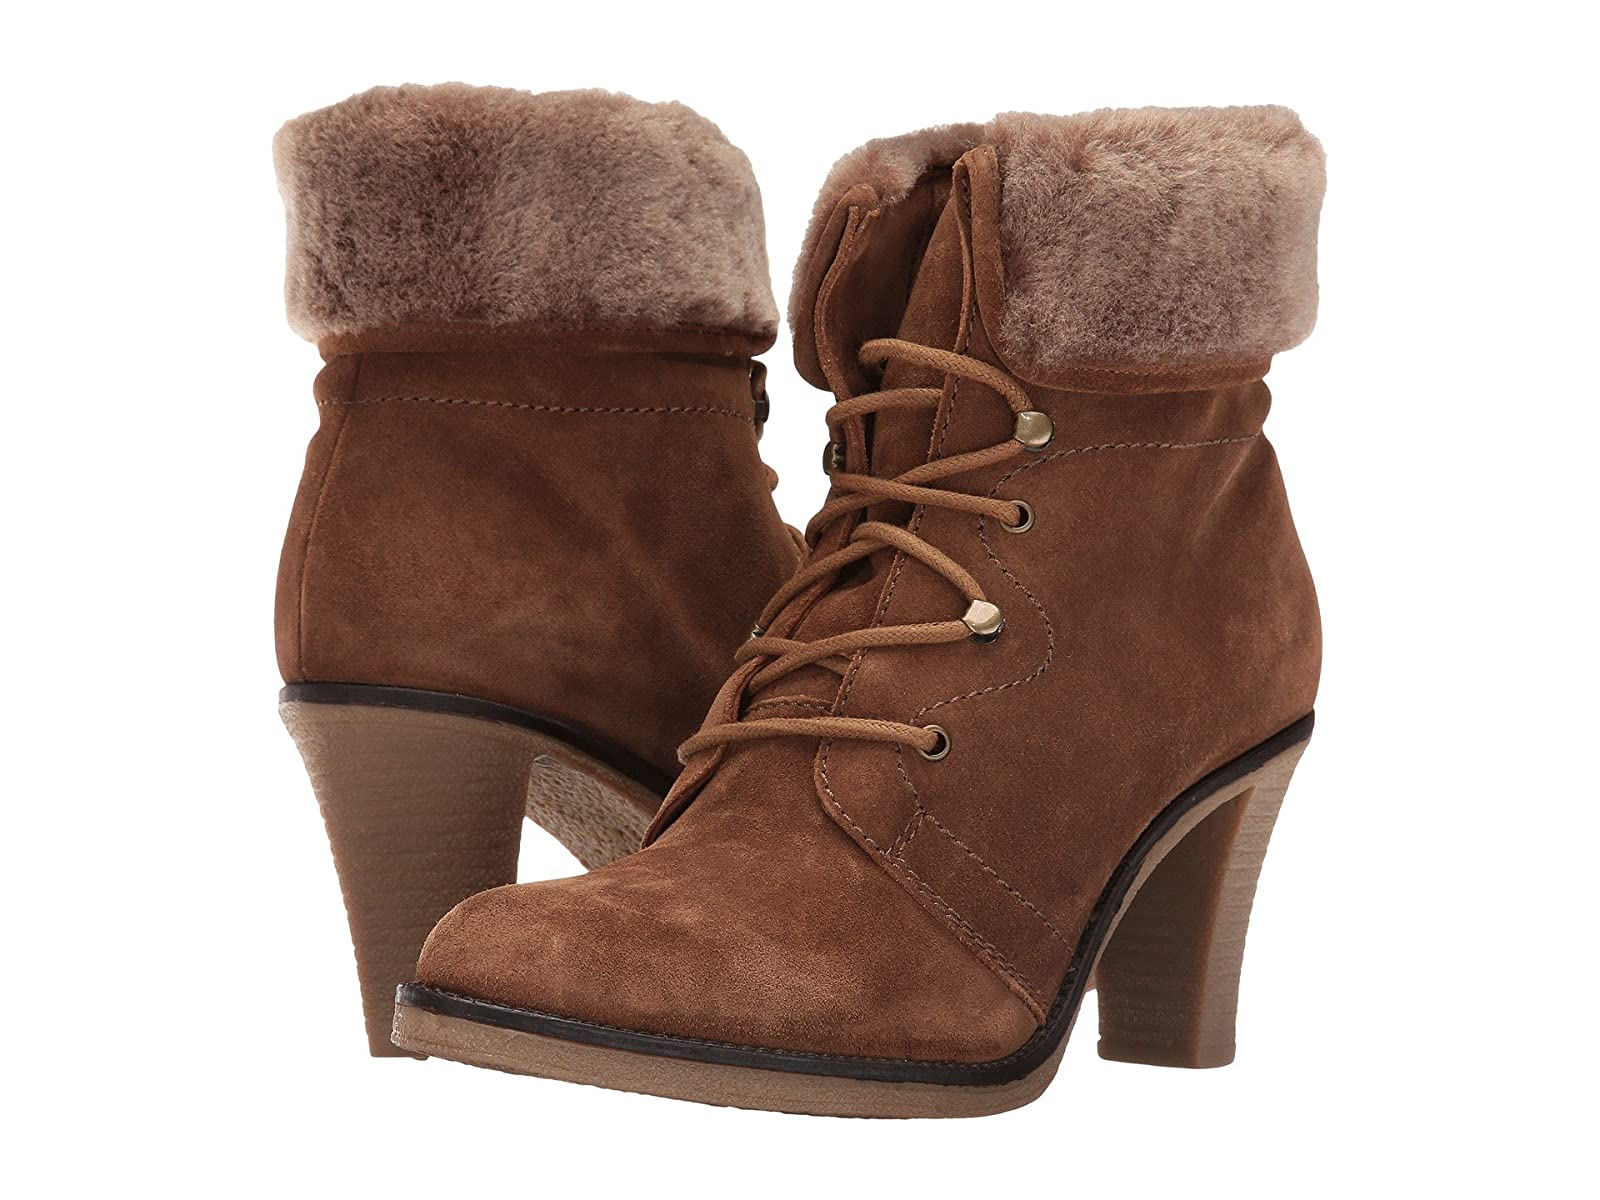 Johnston & Murphy JasmineCheap and distinctive eye-catching shoes